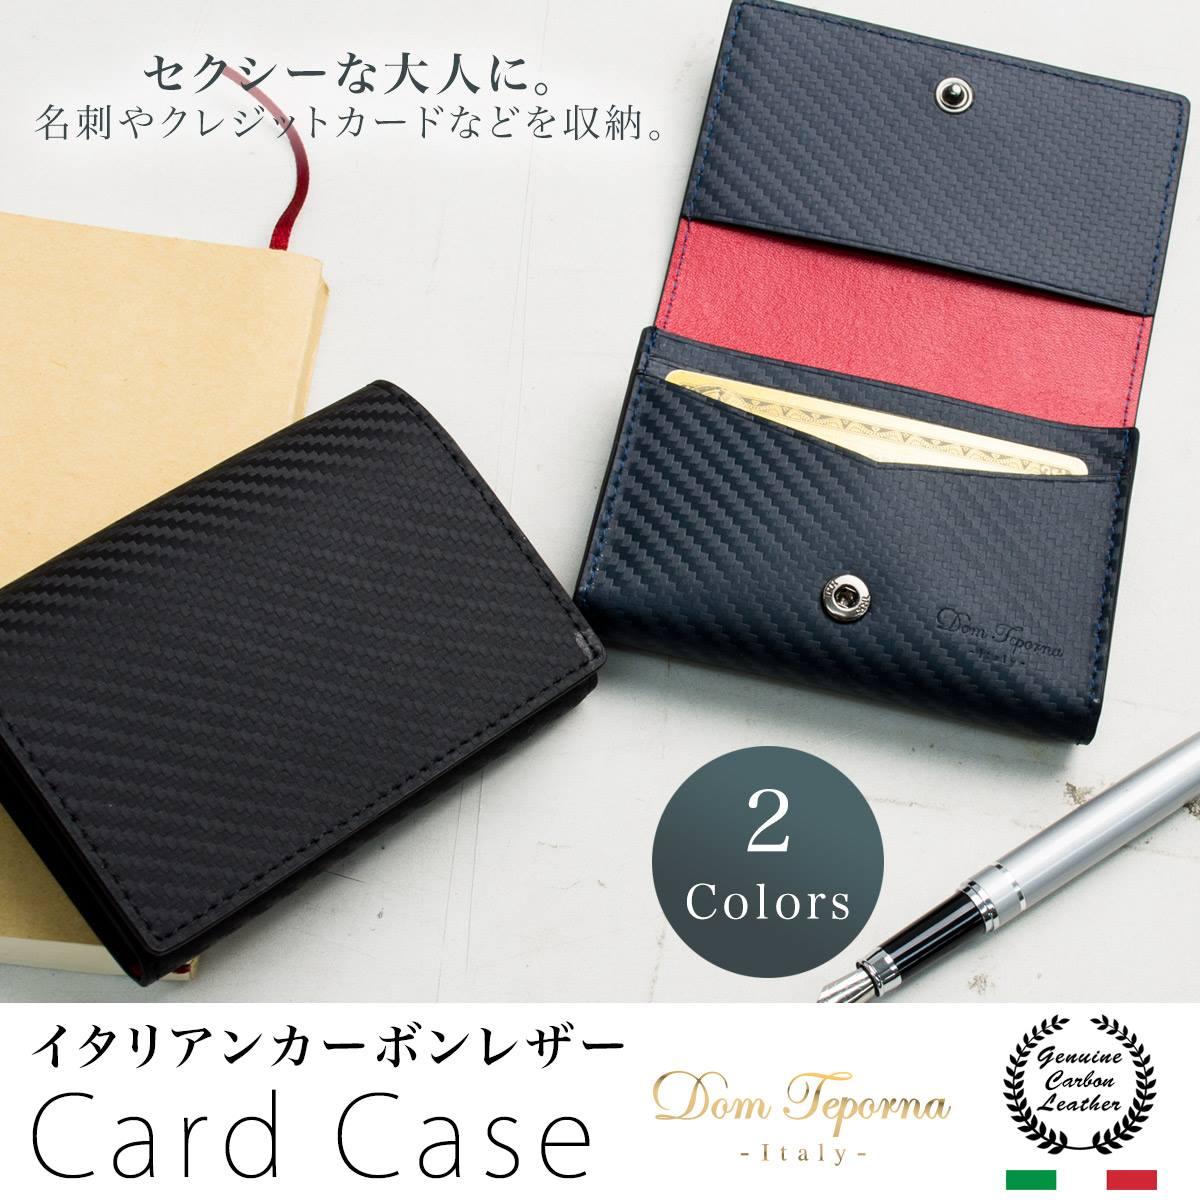 DomTepornaItalyイタリアンカーボンレザーカードケース 名刺入れ